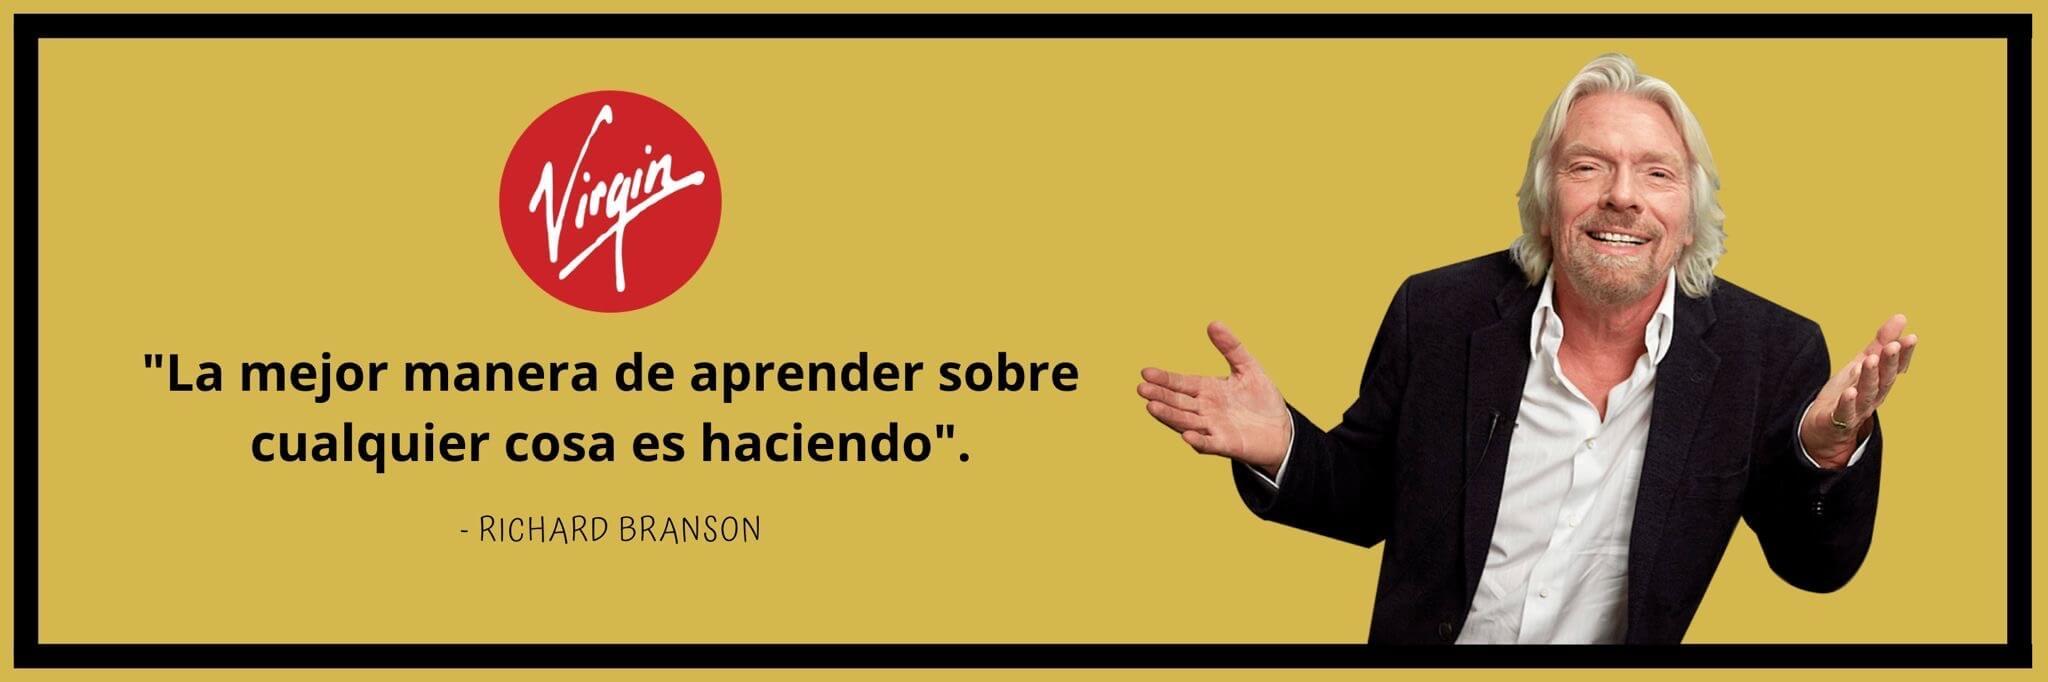 éxito en la vida según las frases de Richard Branson